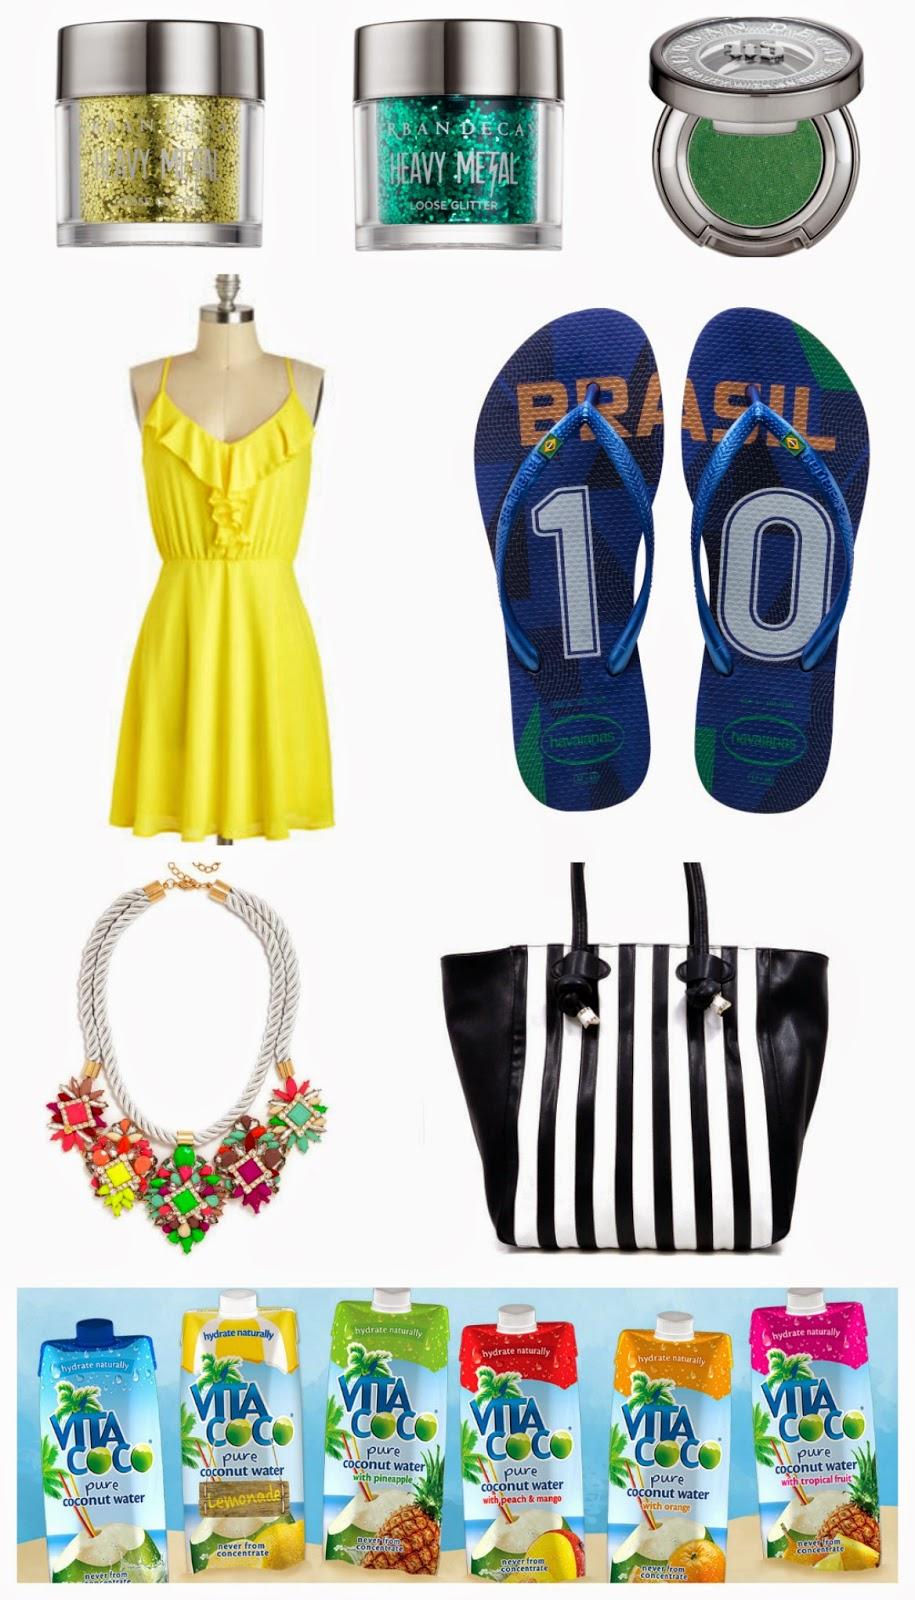 team brazil, world cup, fifa, havaianas, urban decay, vita coco, cid style file, style